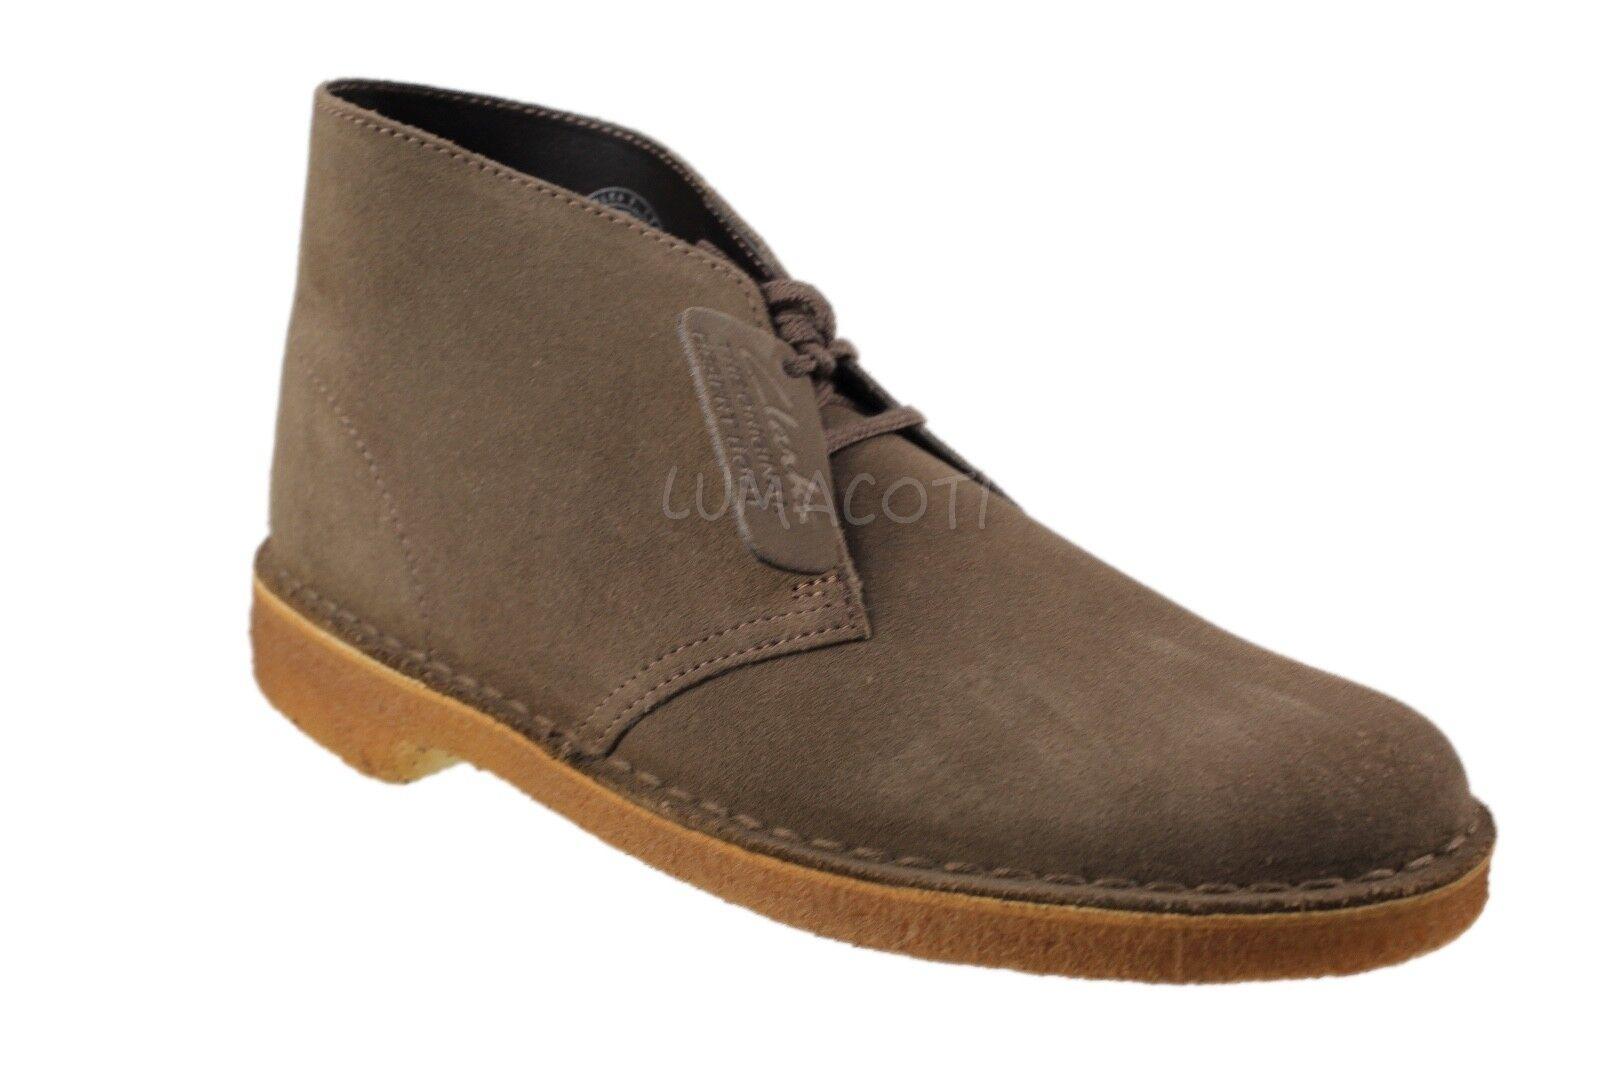 Mens Clarks Originals Desert Boot Olive Suede [26182682]